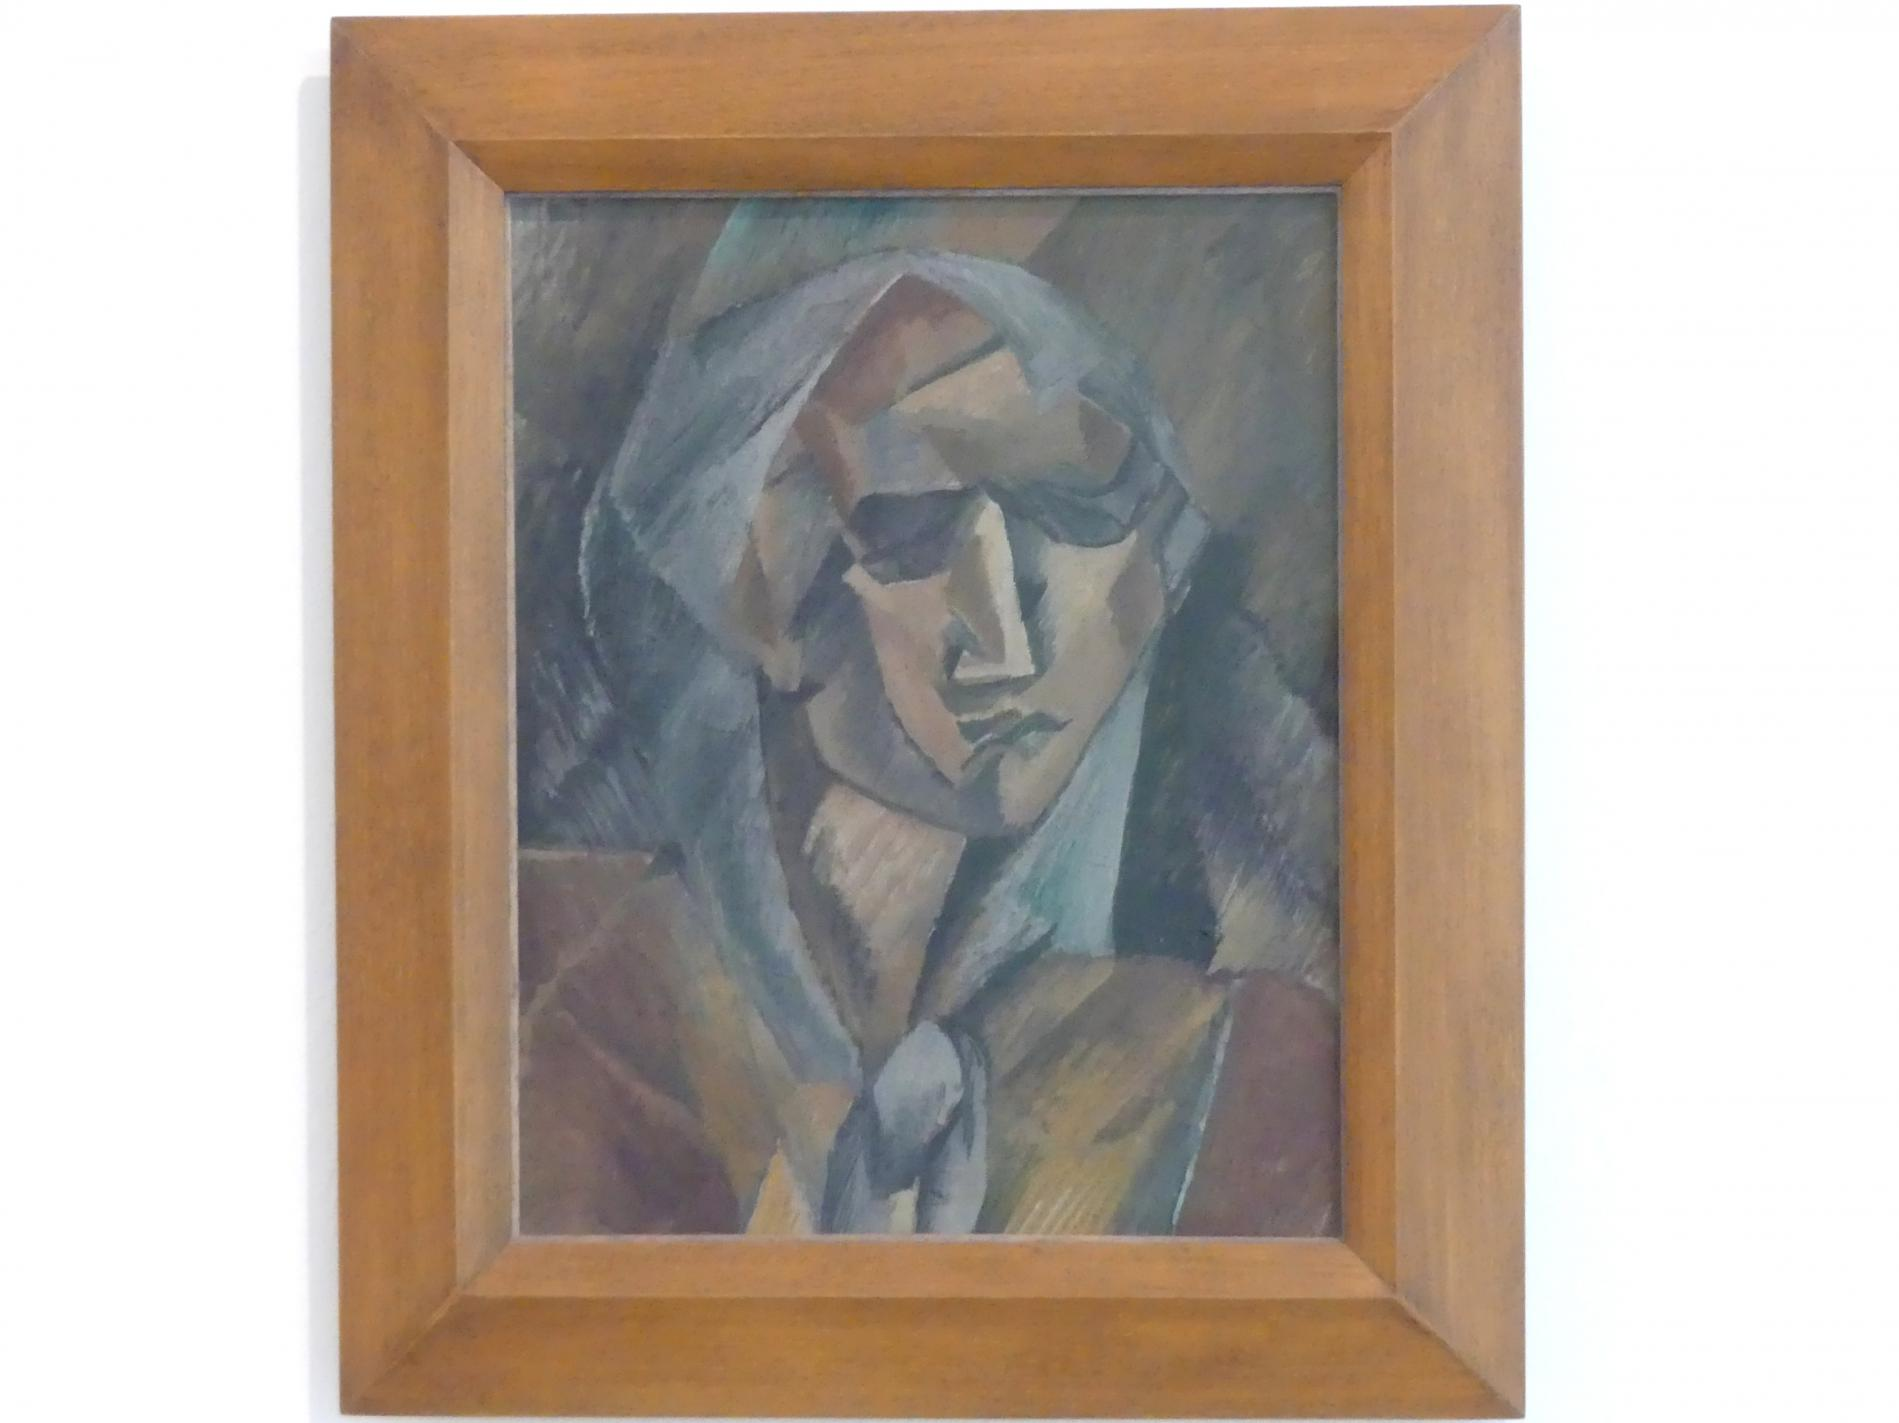 Georges Braque: Frauenkopf, 1909